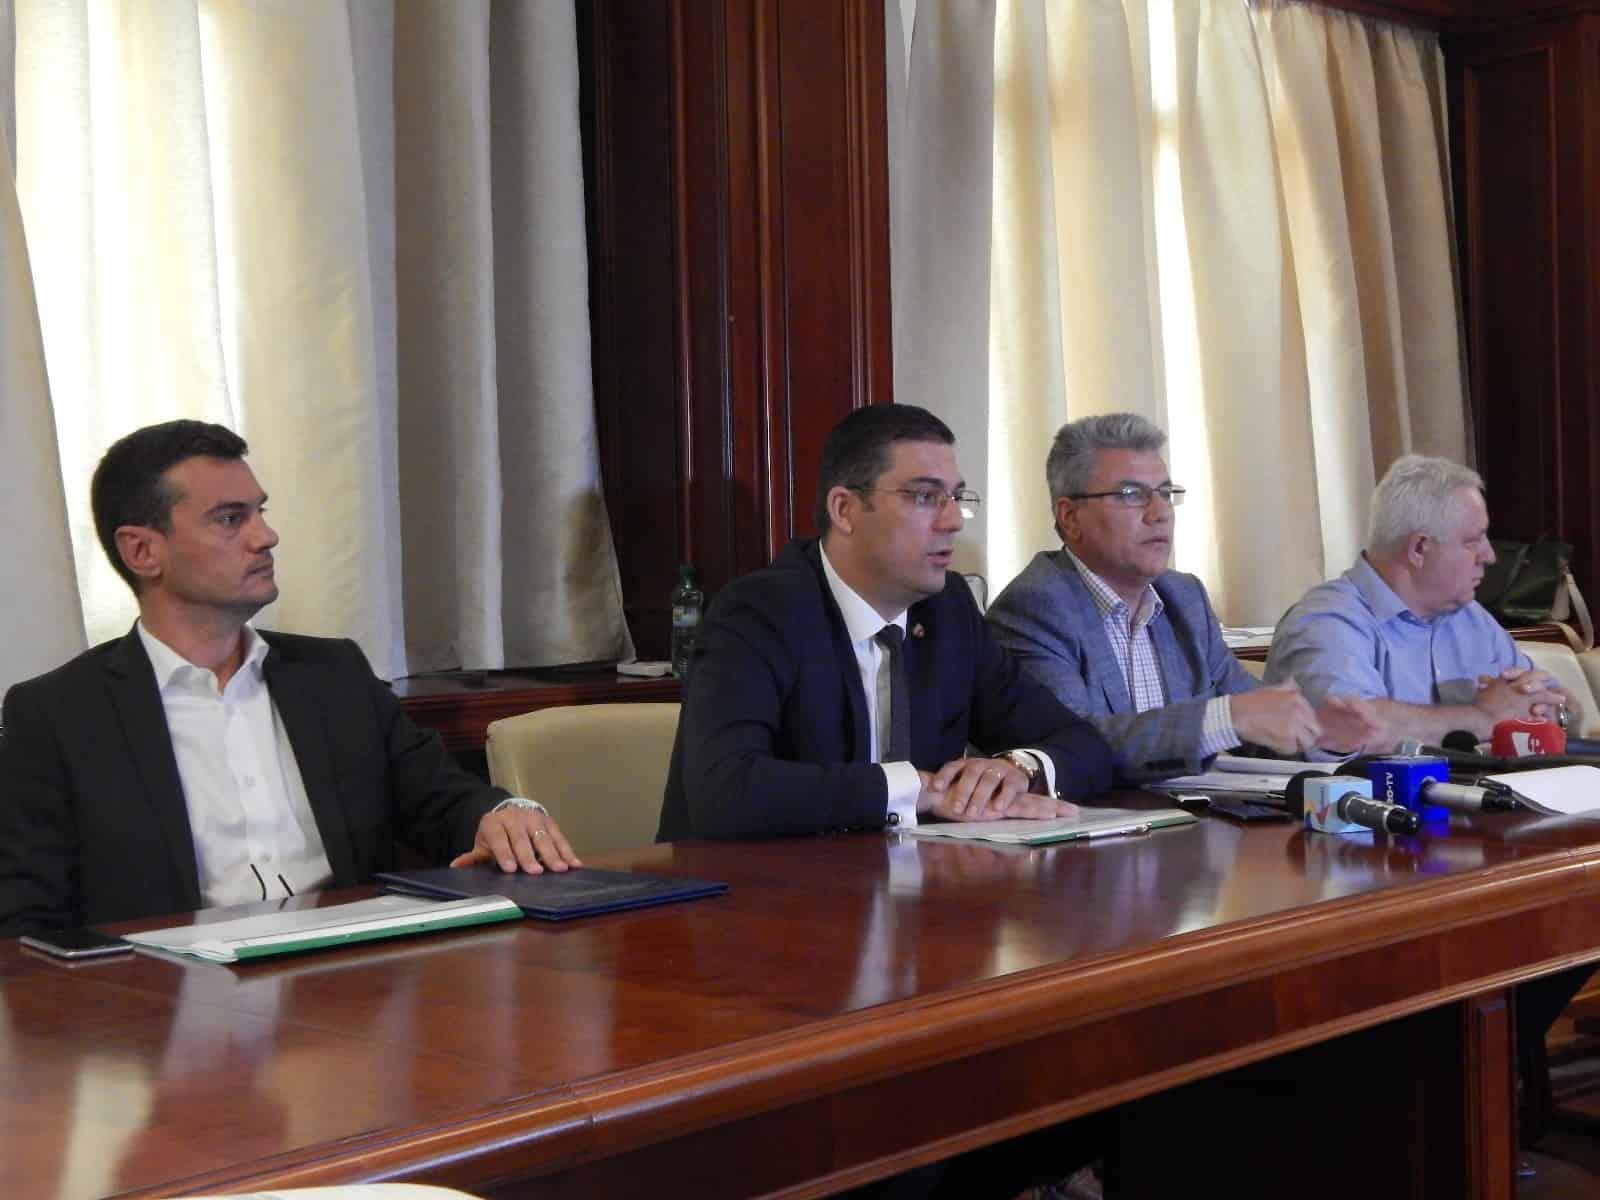 Ioan Denes – Horia Tutuianu – Dan Jeaca – Hristu Uzun